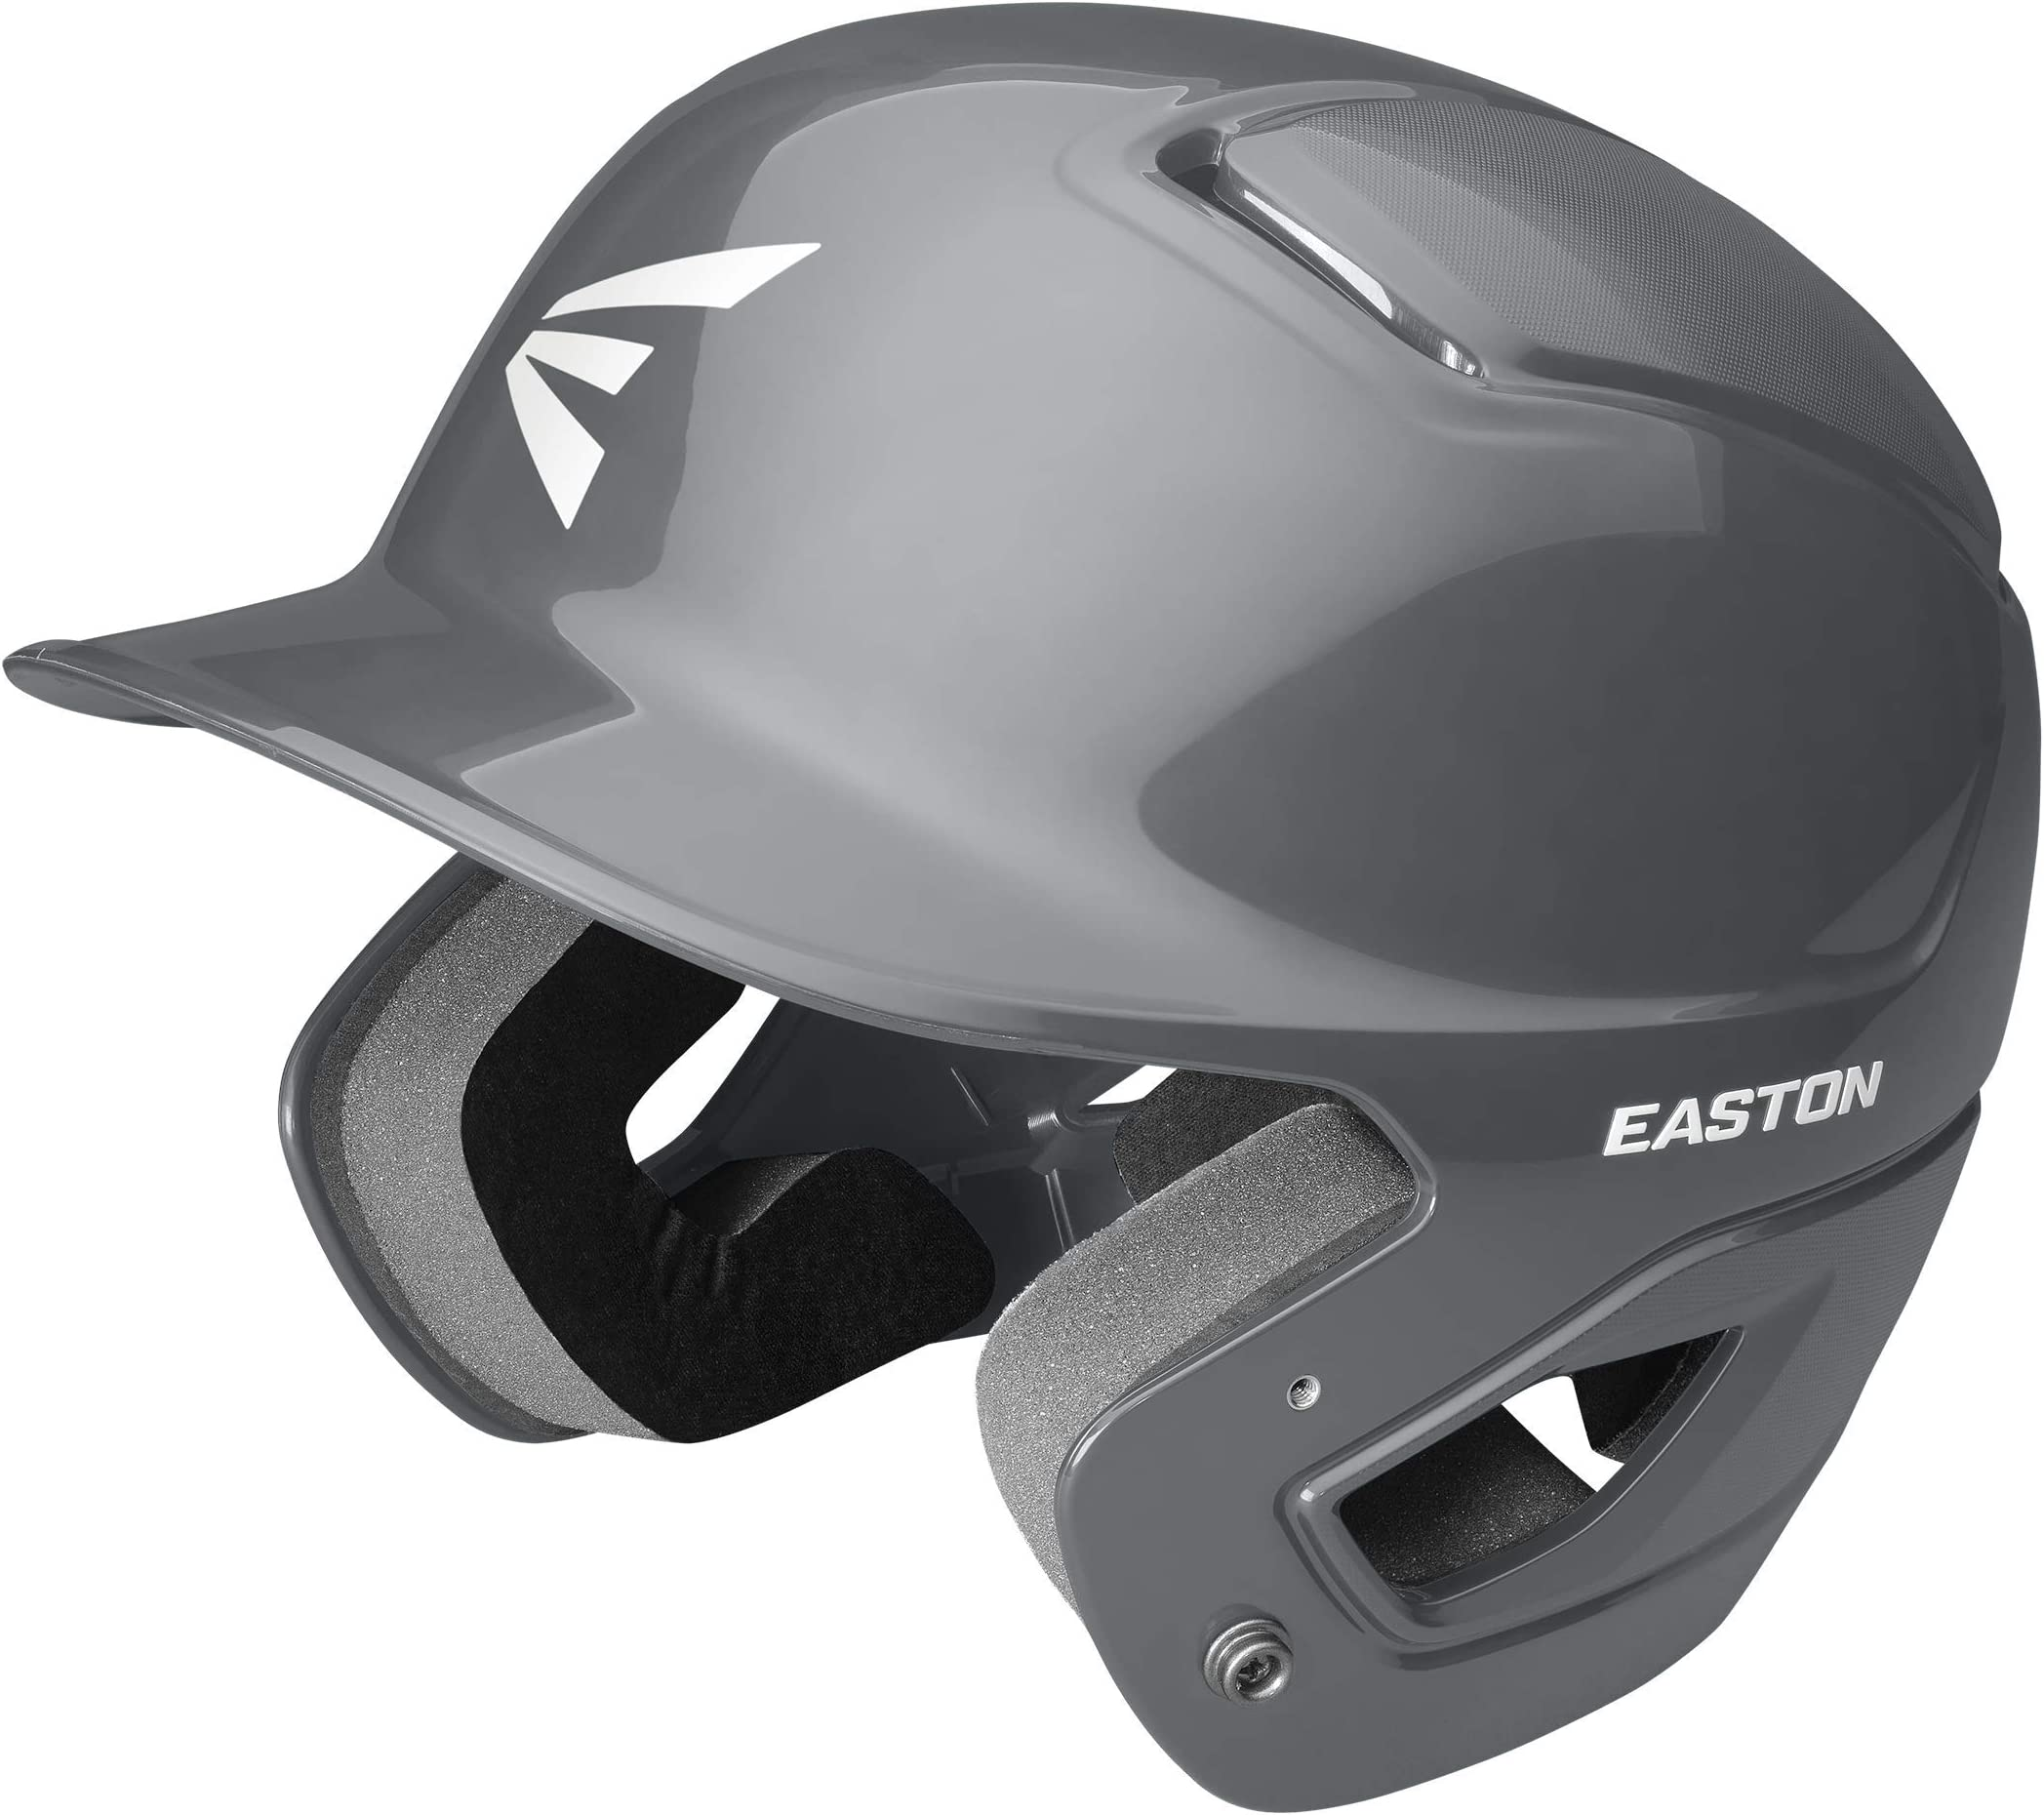 Easton Alpha Baseball Batting Helmet, 2021, Dual-Density Impact Absorption Foam, High Impact Resistant ABS Shell, Moisture Wicking BioDRI Liner, JAW Guard Compatible